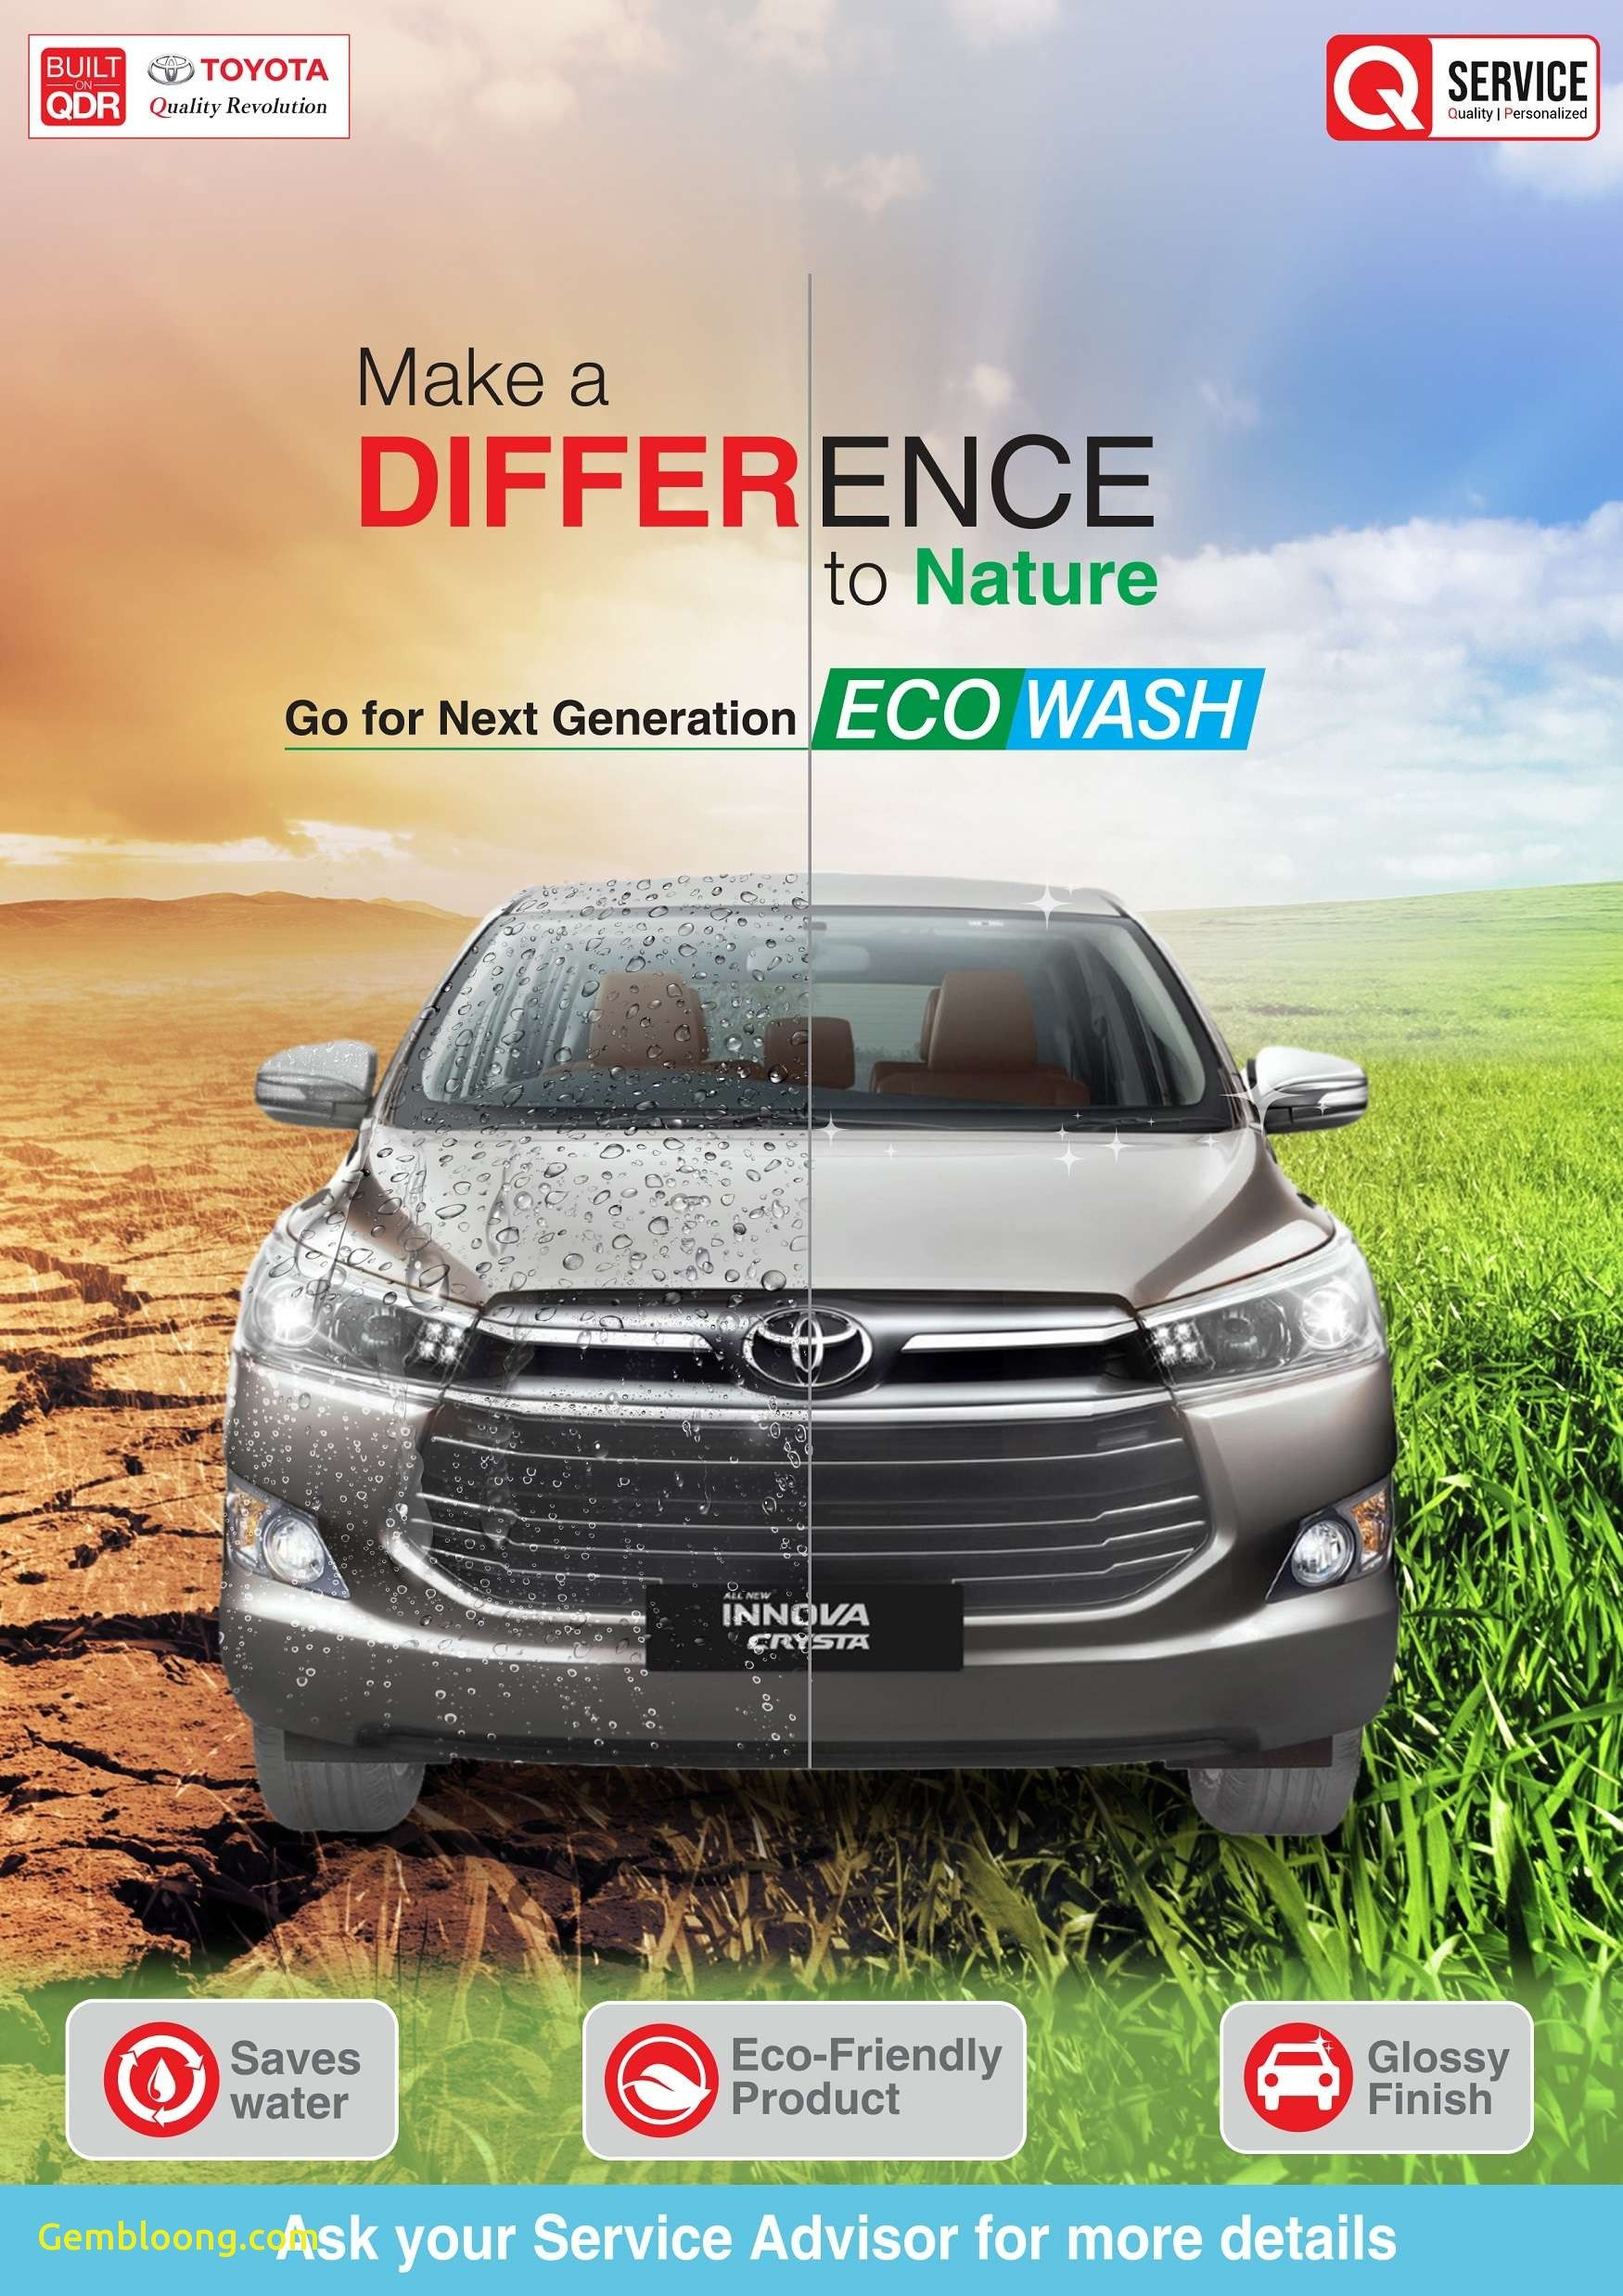 Truck Car Wash Near Me >> Car Wash Locations Near Me Inspirational Toyota Toyota